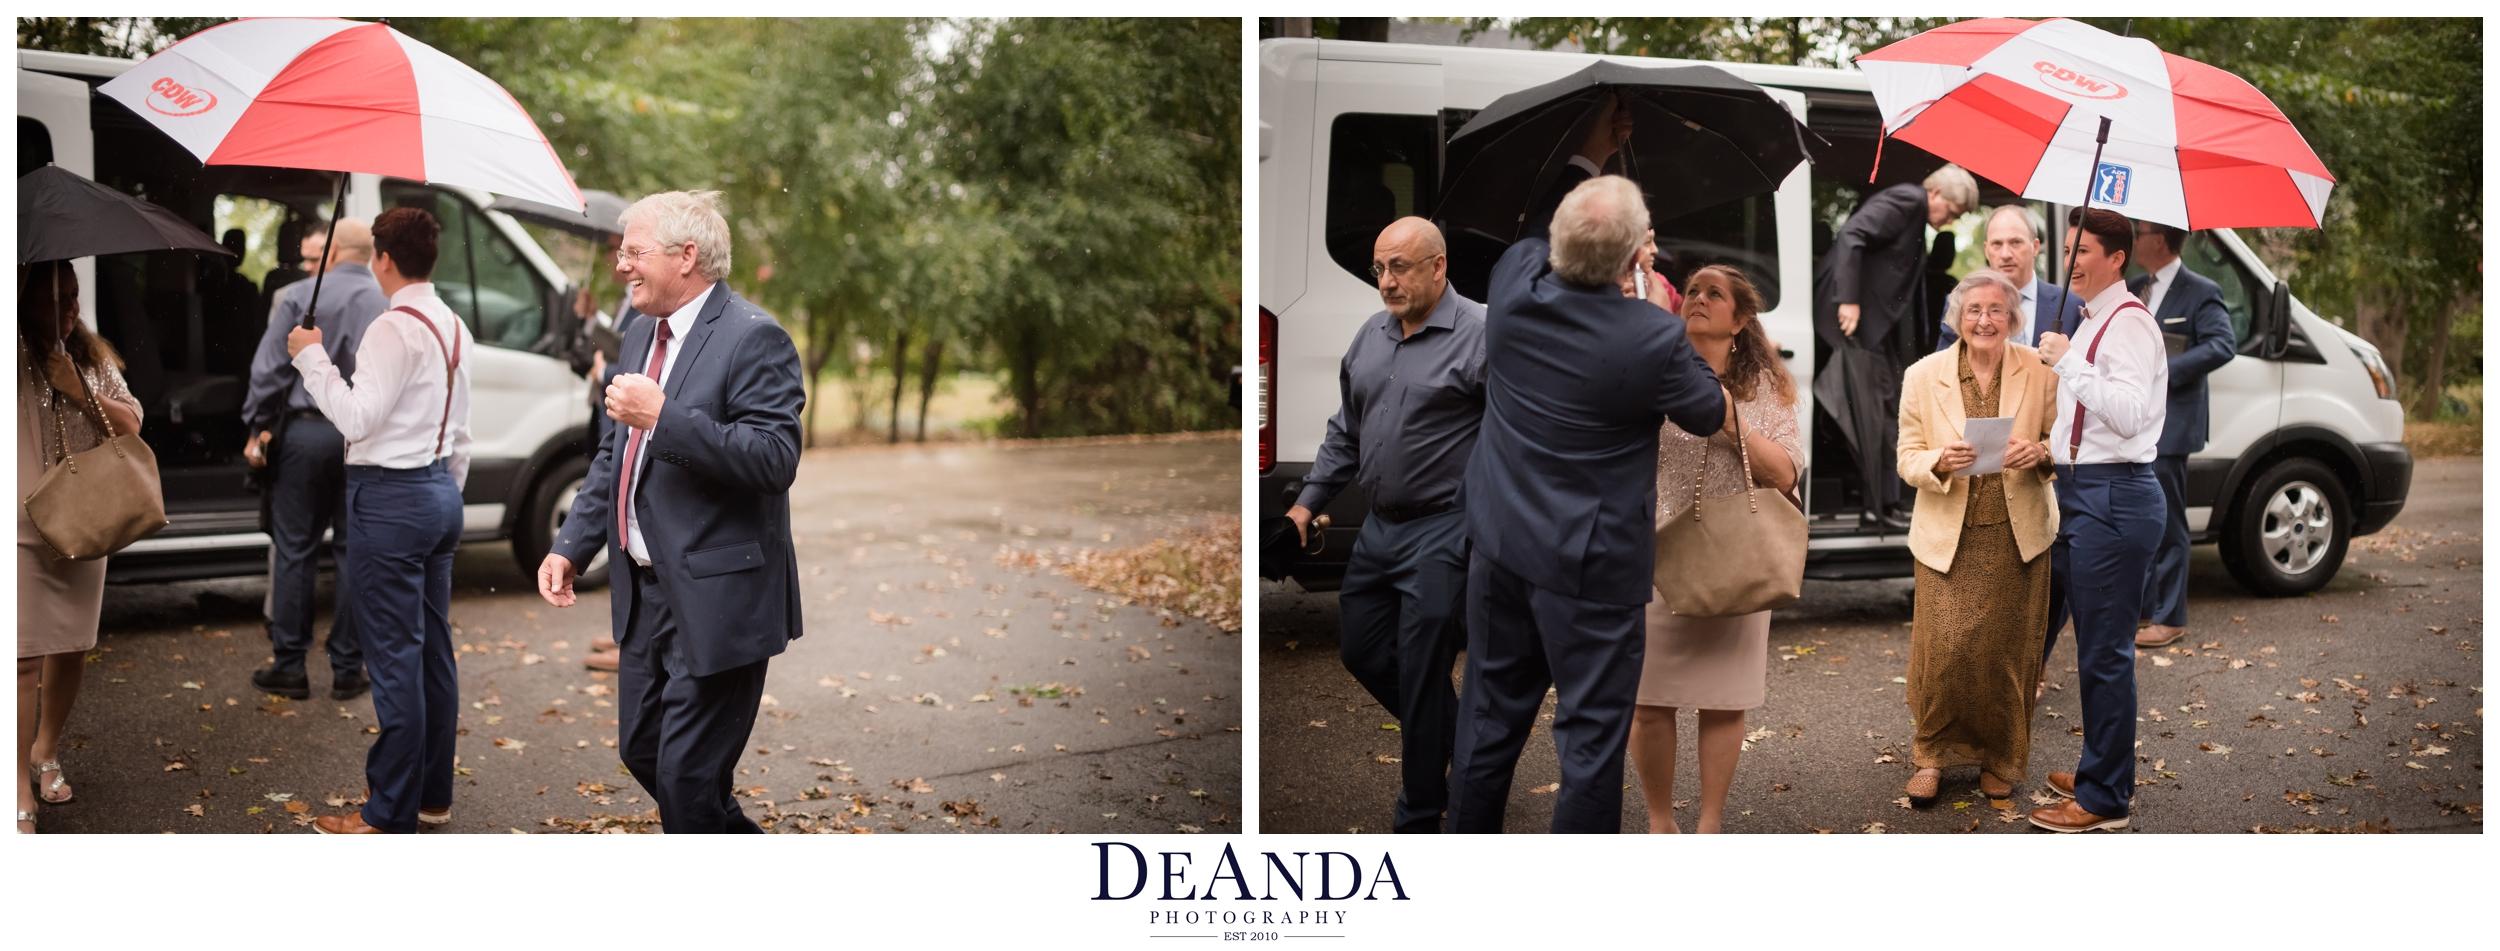 guests arriving under umbrellas to rainy October wedding in Chicago